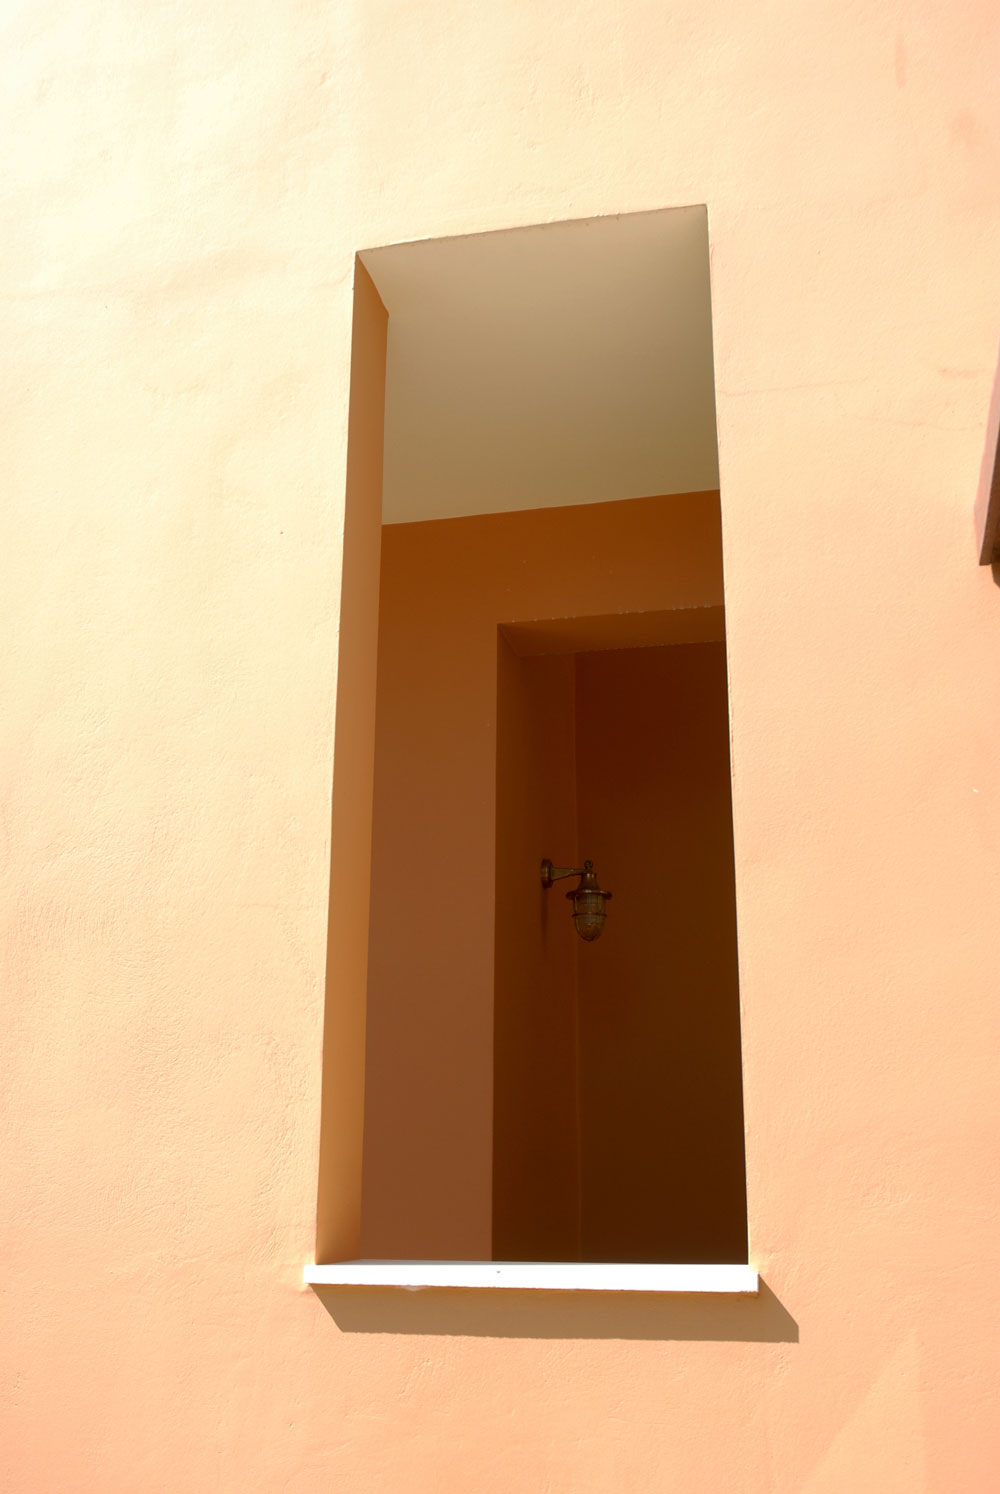 pistachio-trees-shadows-hotel-project-studio265-7